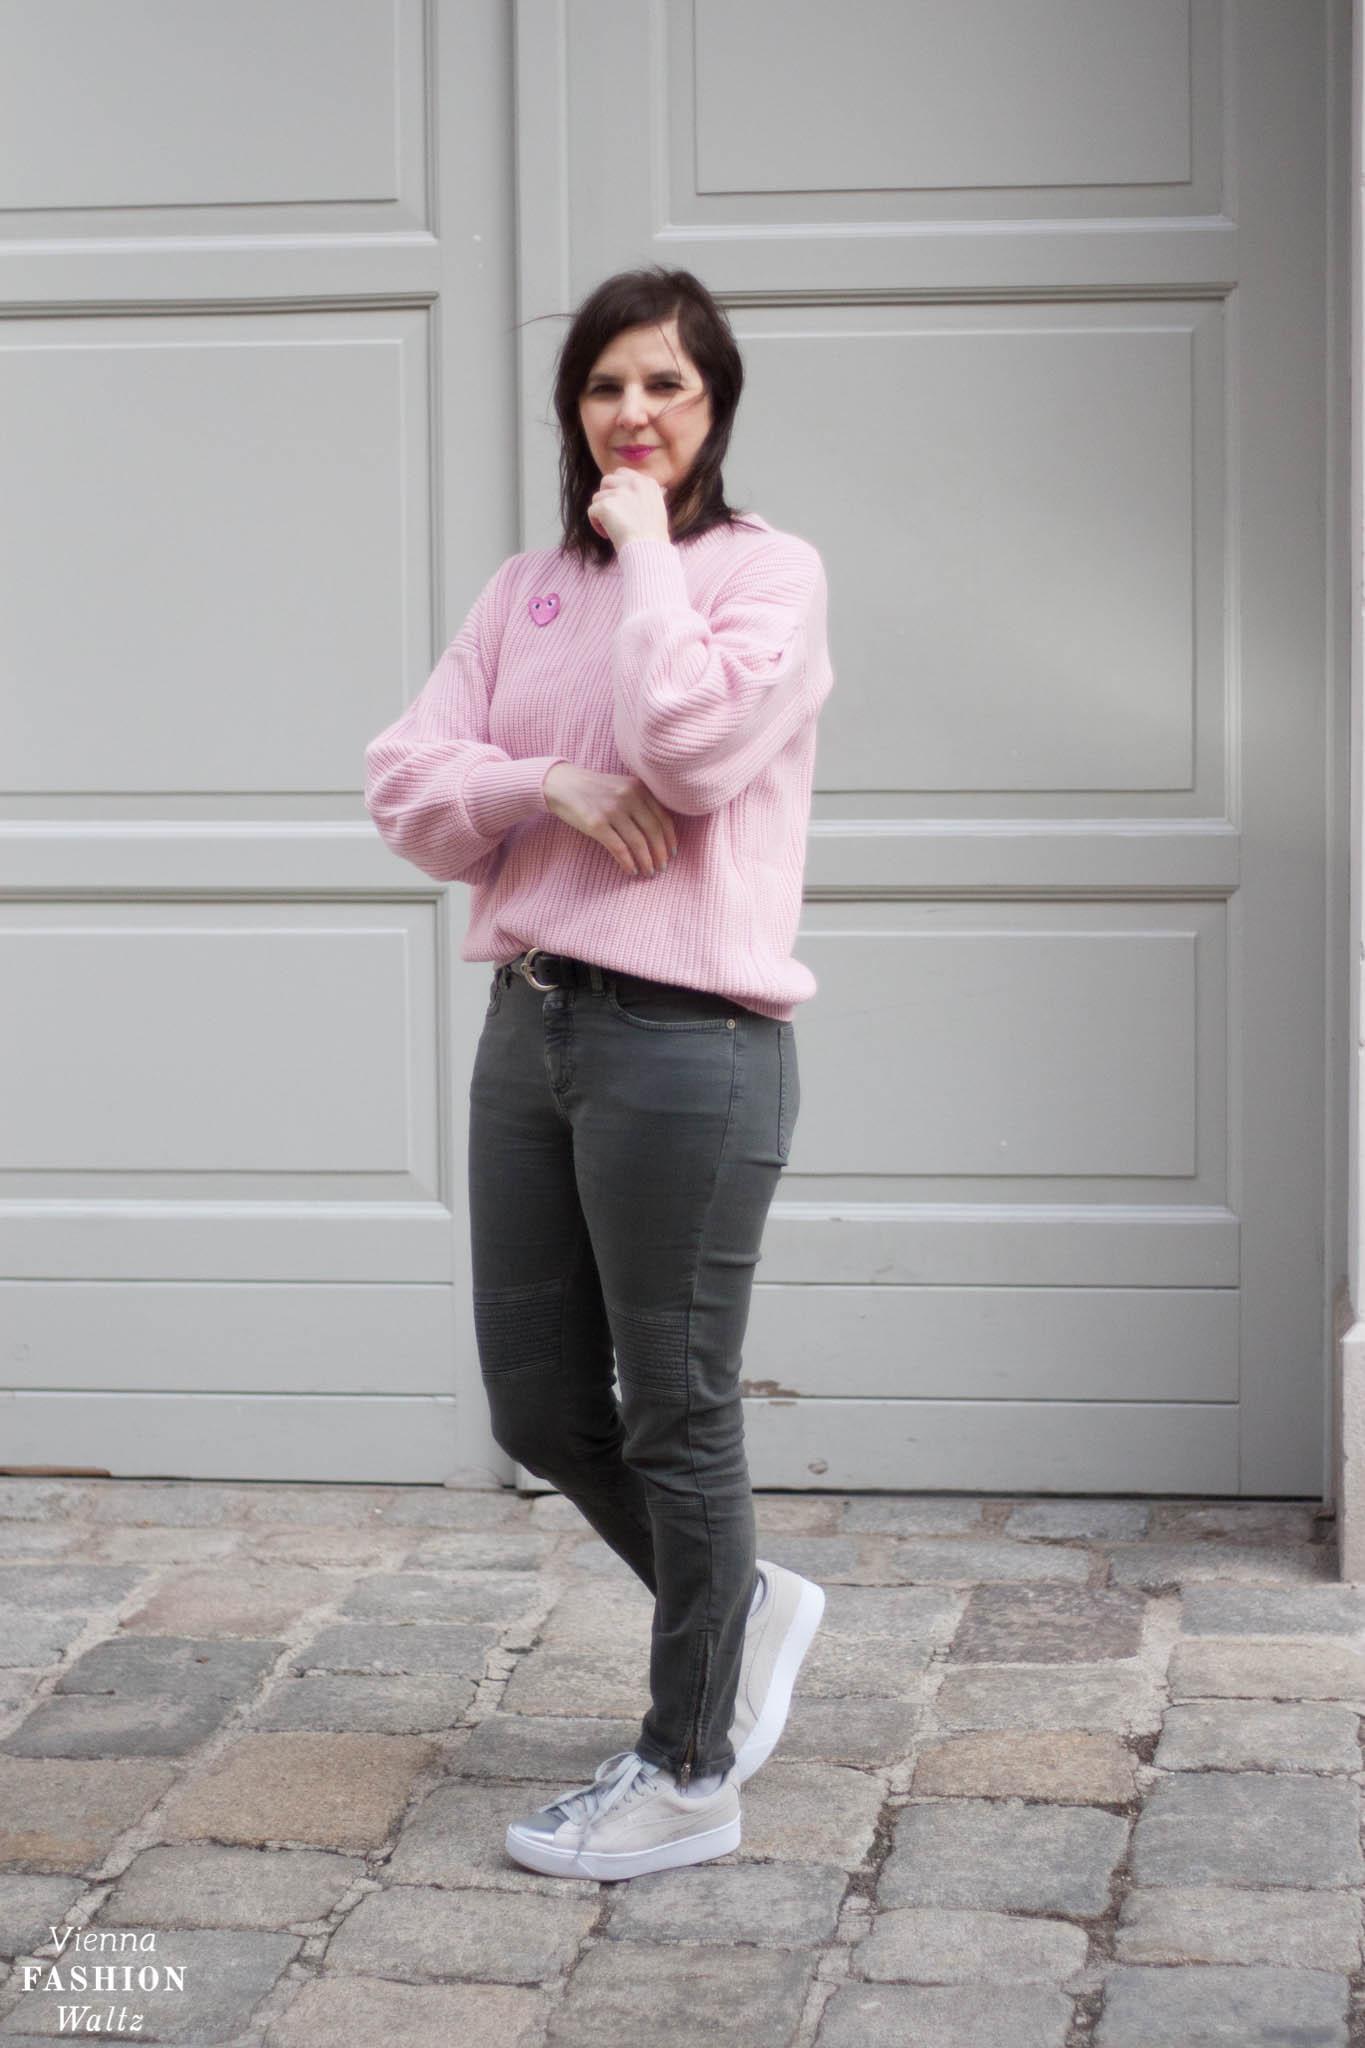 Strickpulli & Jeans Pinterest Deichmann Puma Sneakers